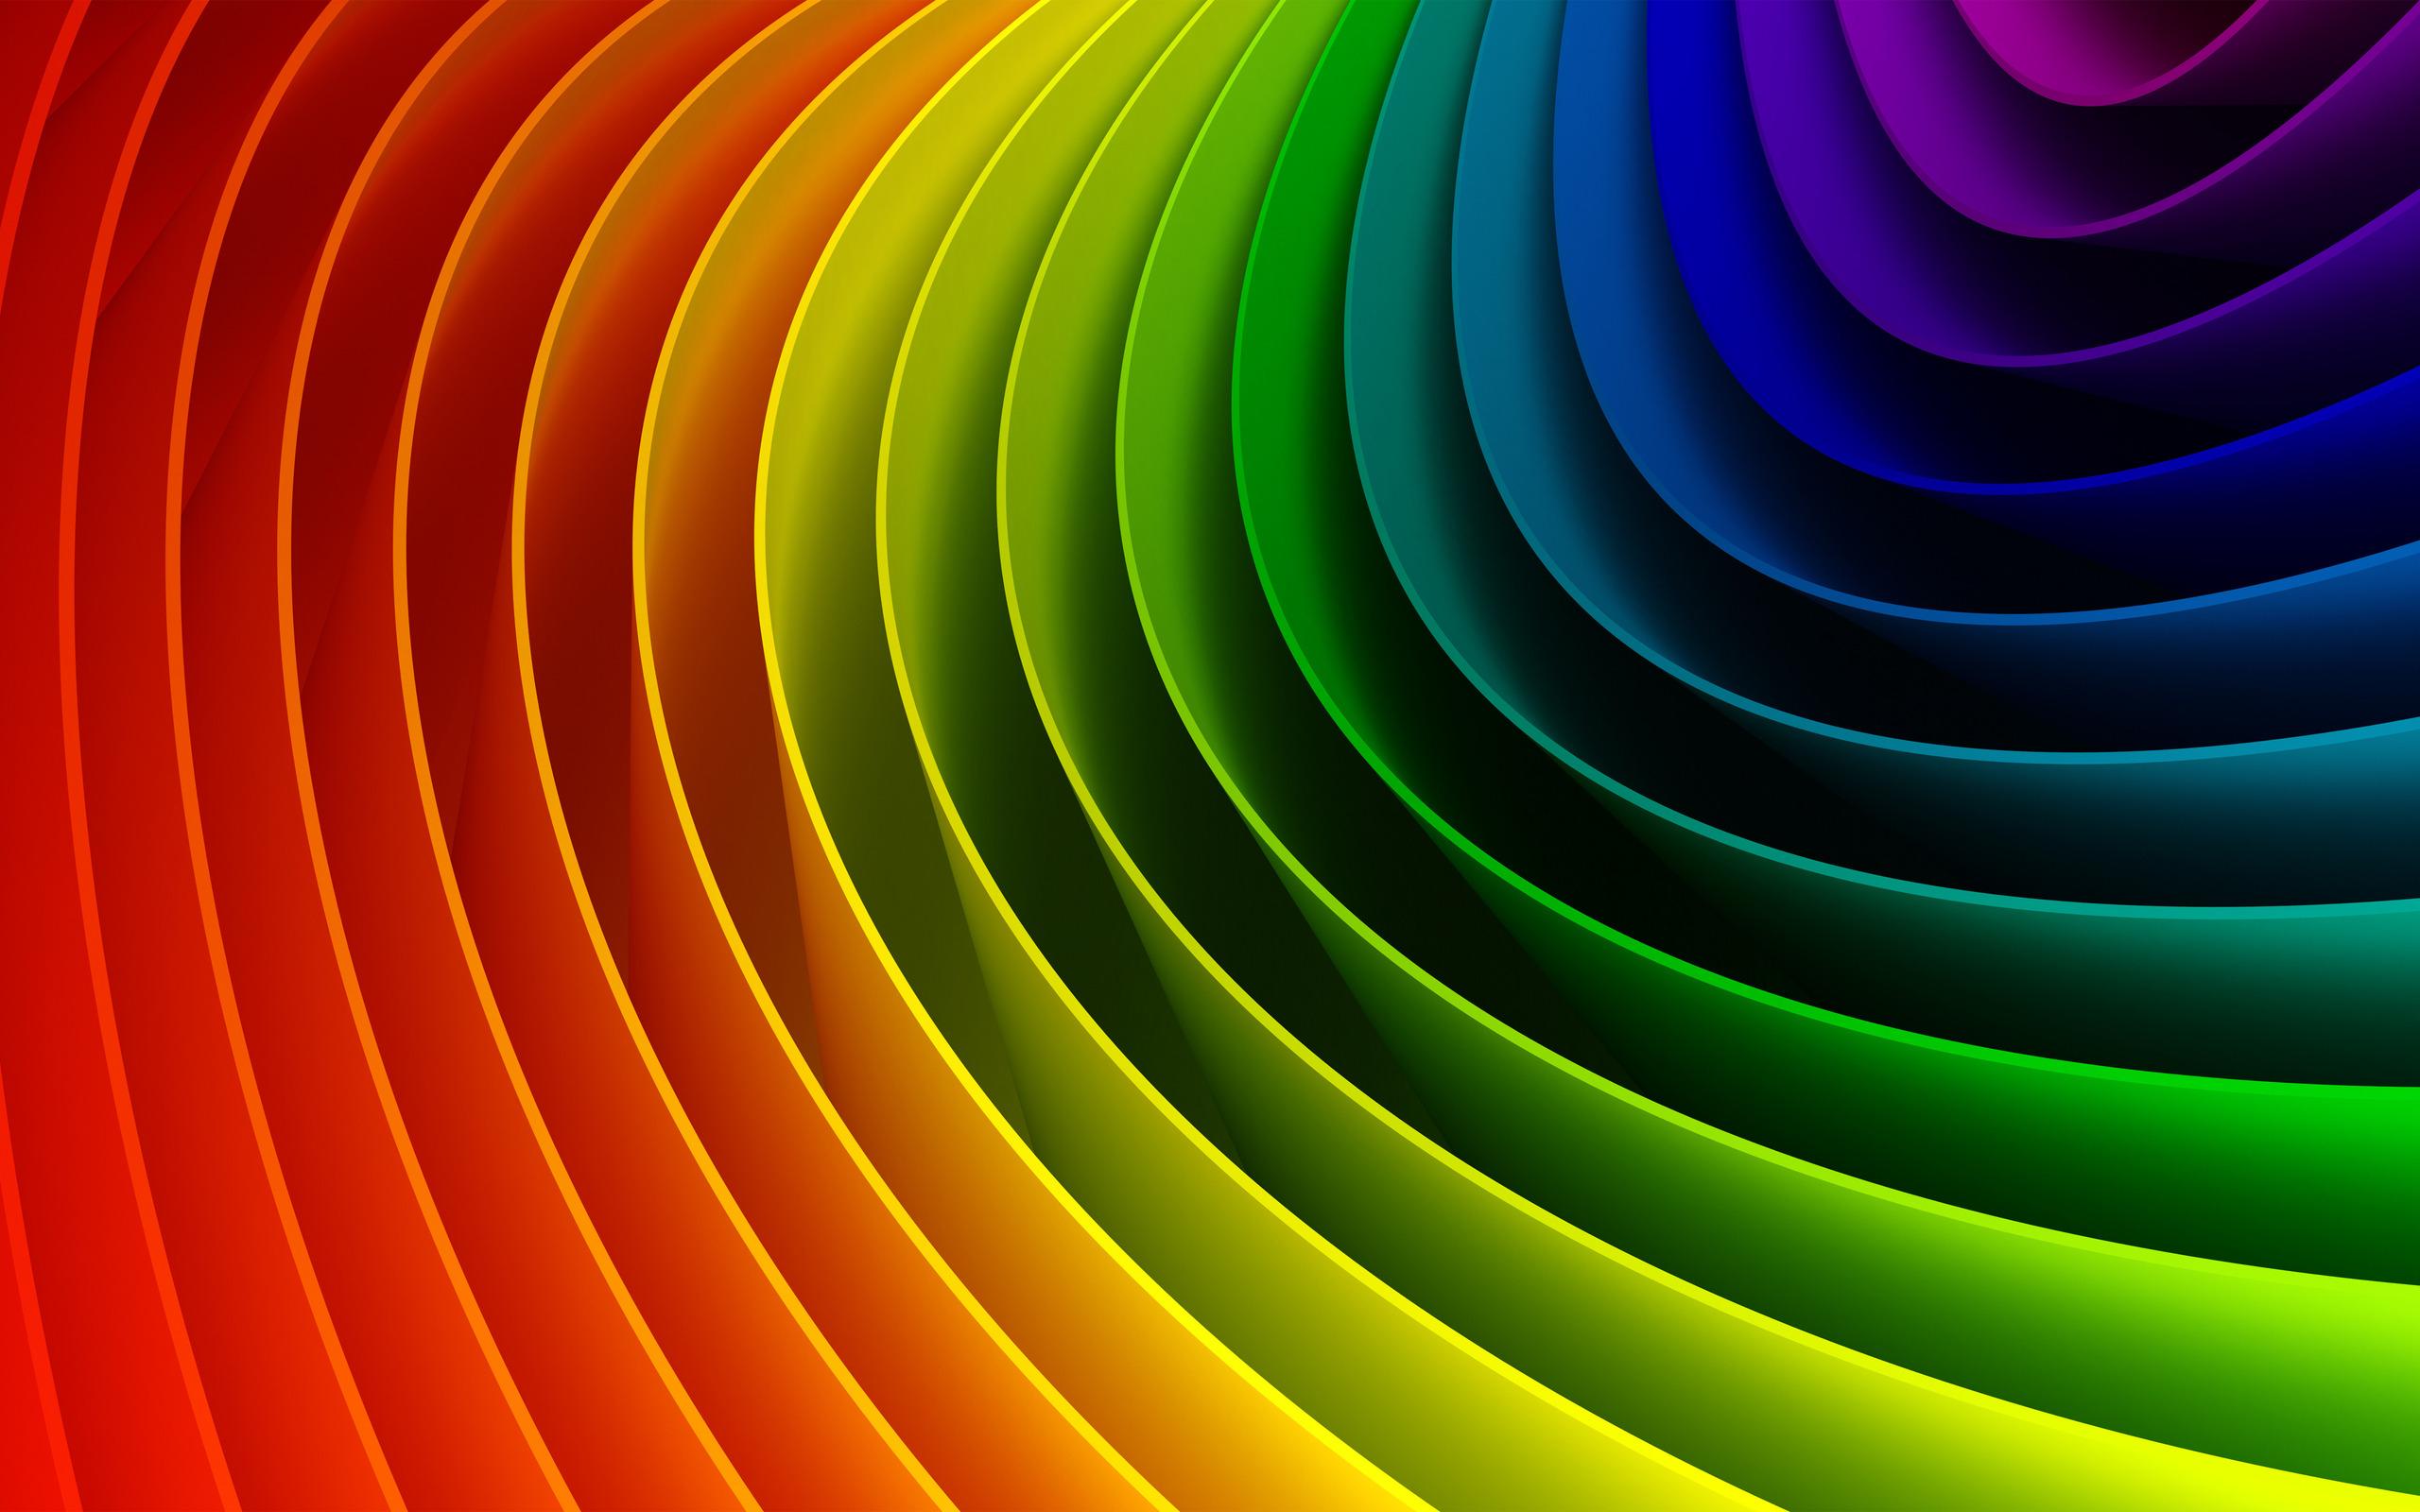 Alle farben des regenbogens wallpaper 2560x1600 2560х1600